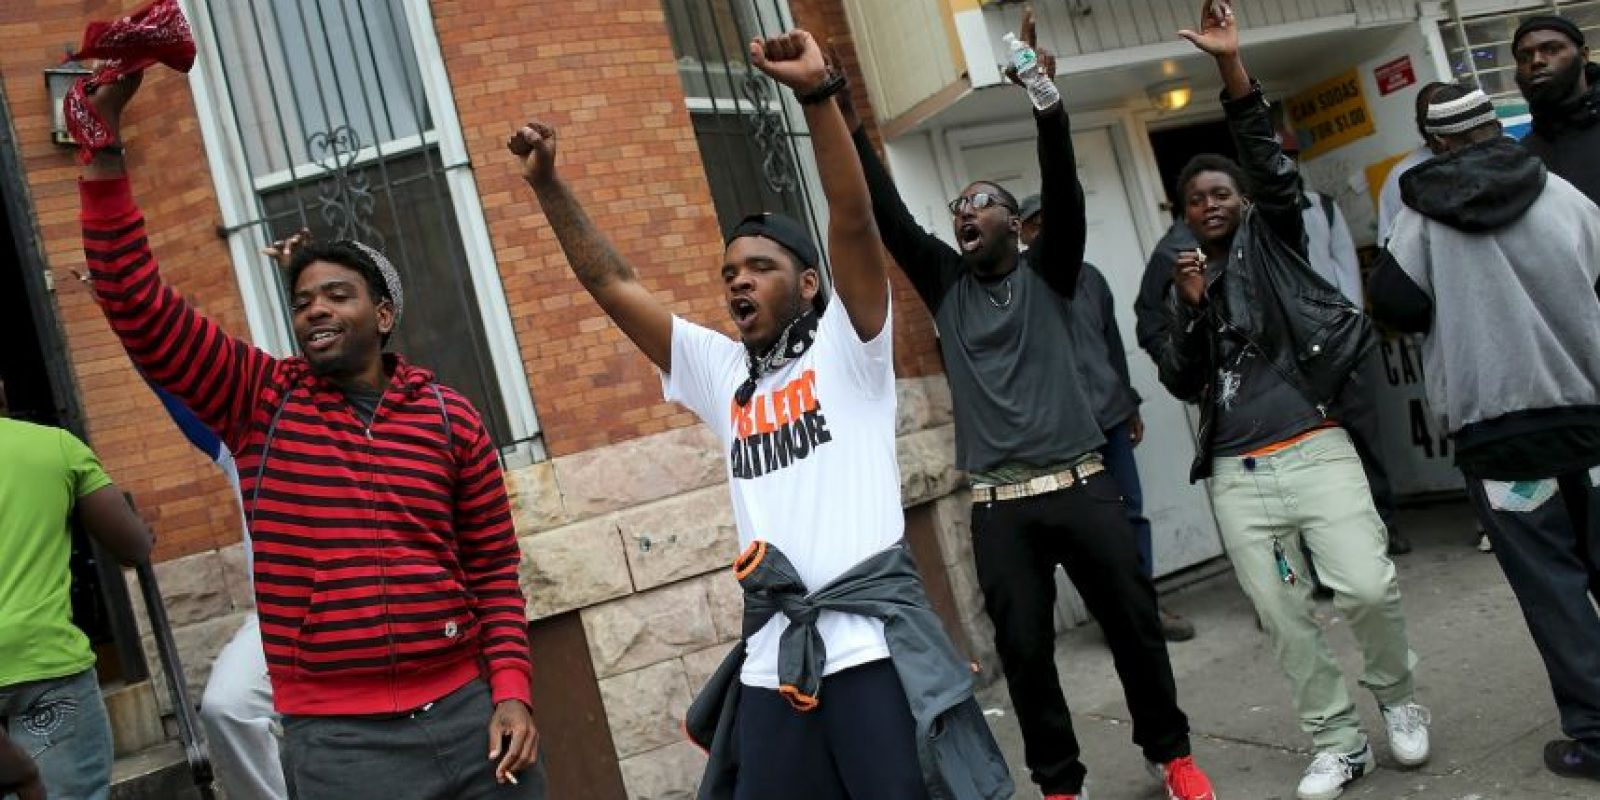 Samuel Dubose, la víctima era un hombre afroamericano. Foto:Getty Images